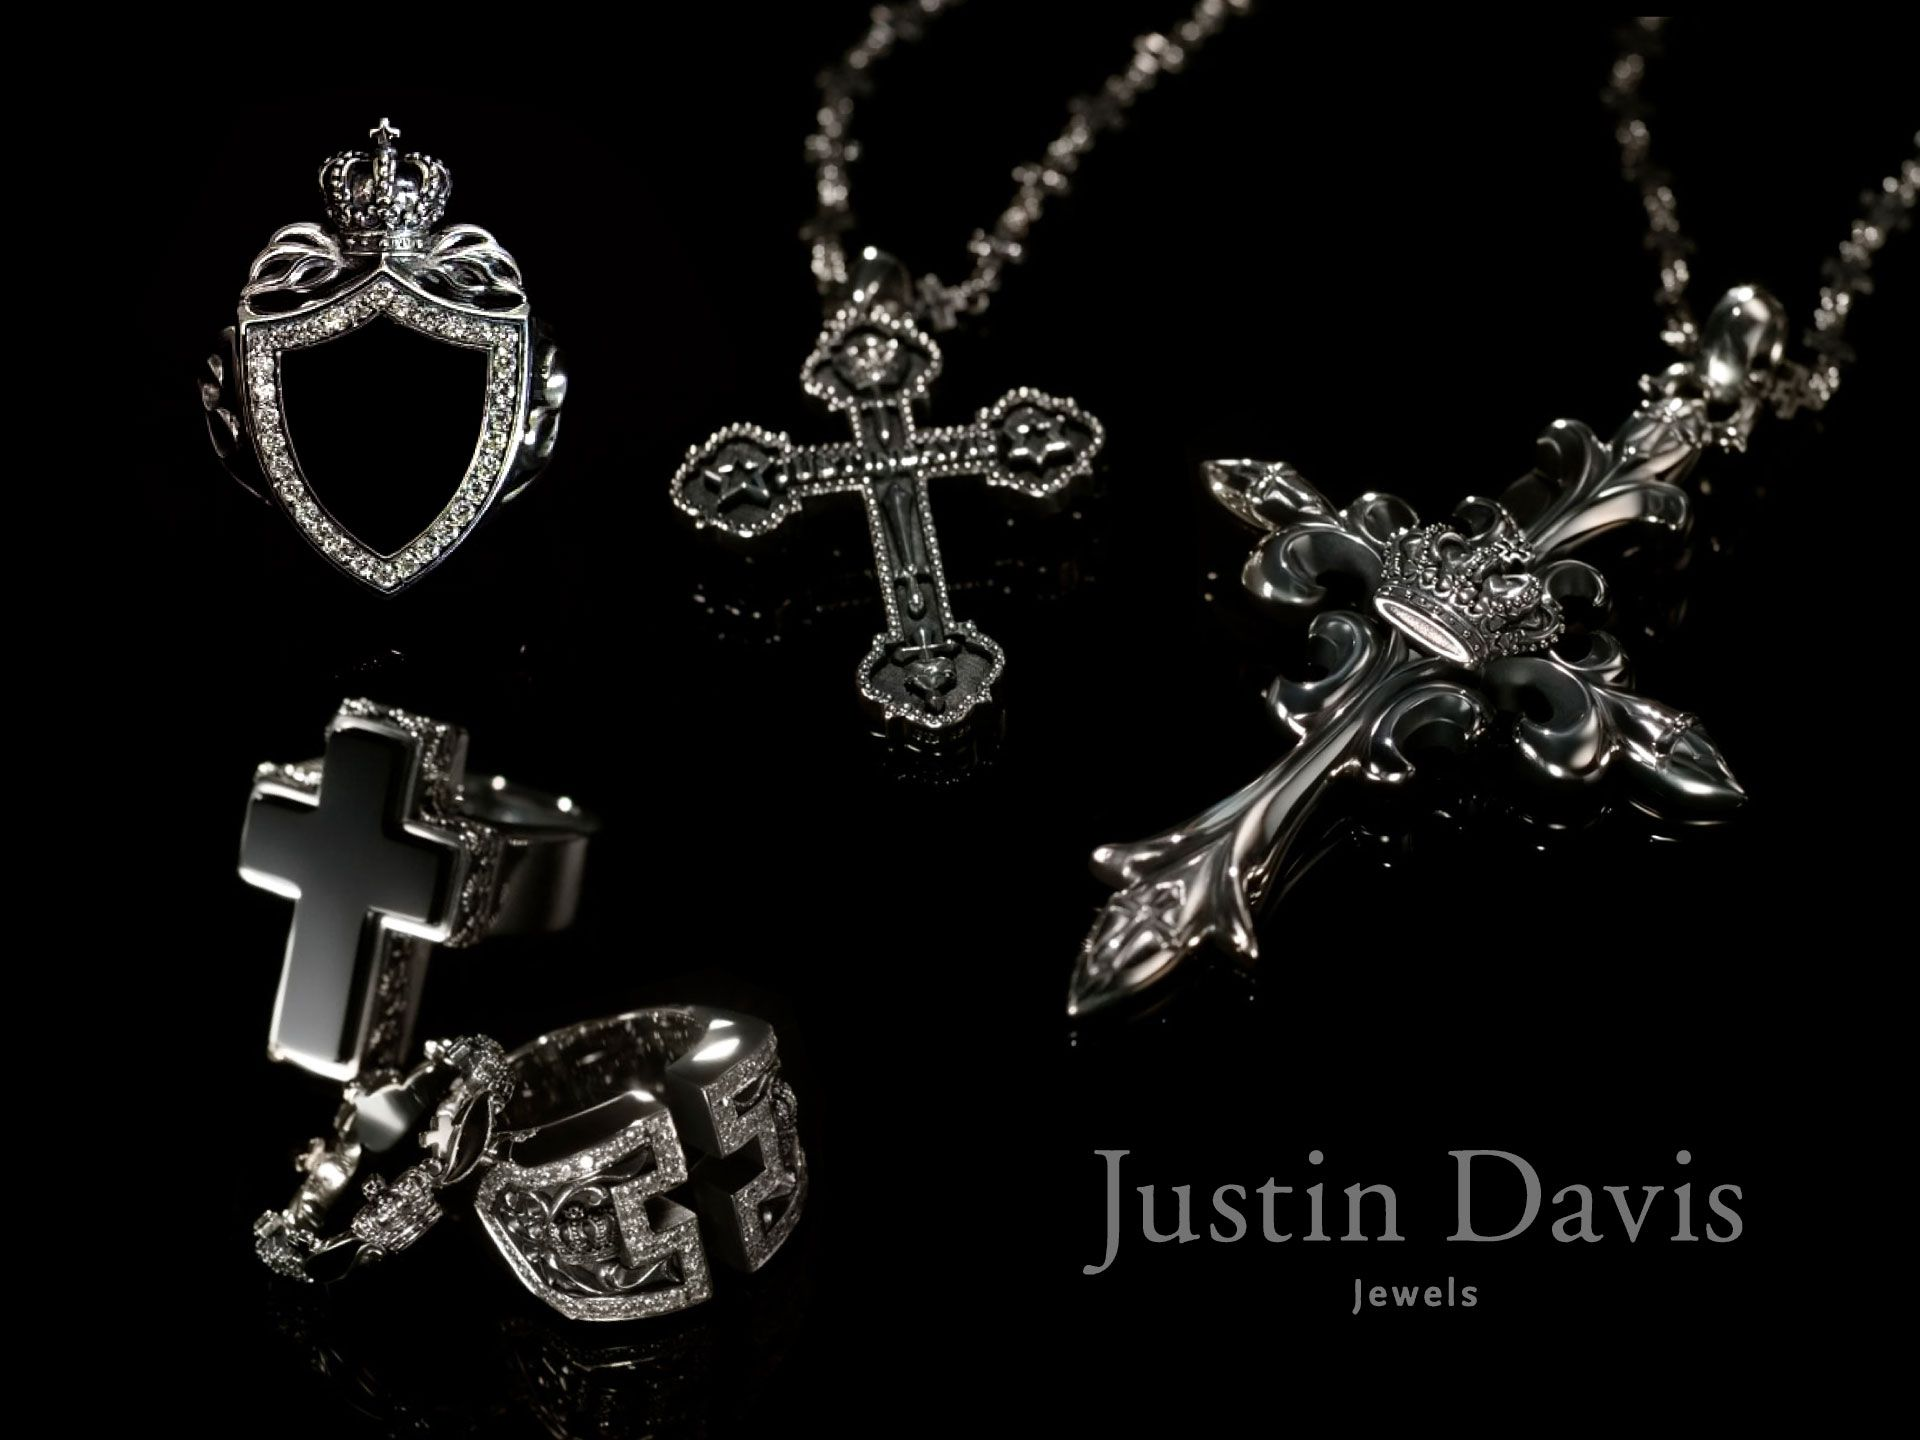 JUSTIN DAVIS(ジャスティン デイビス)